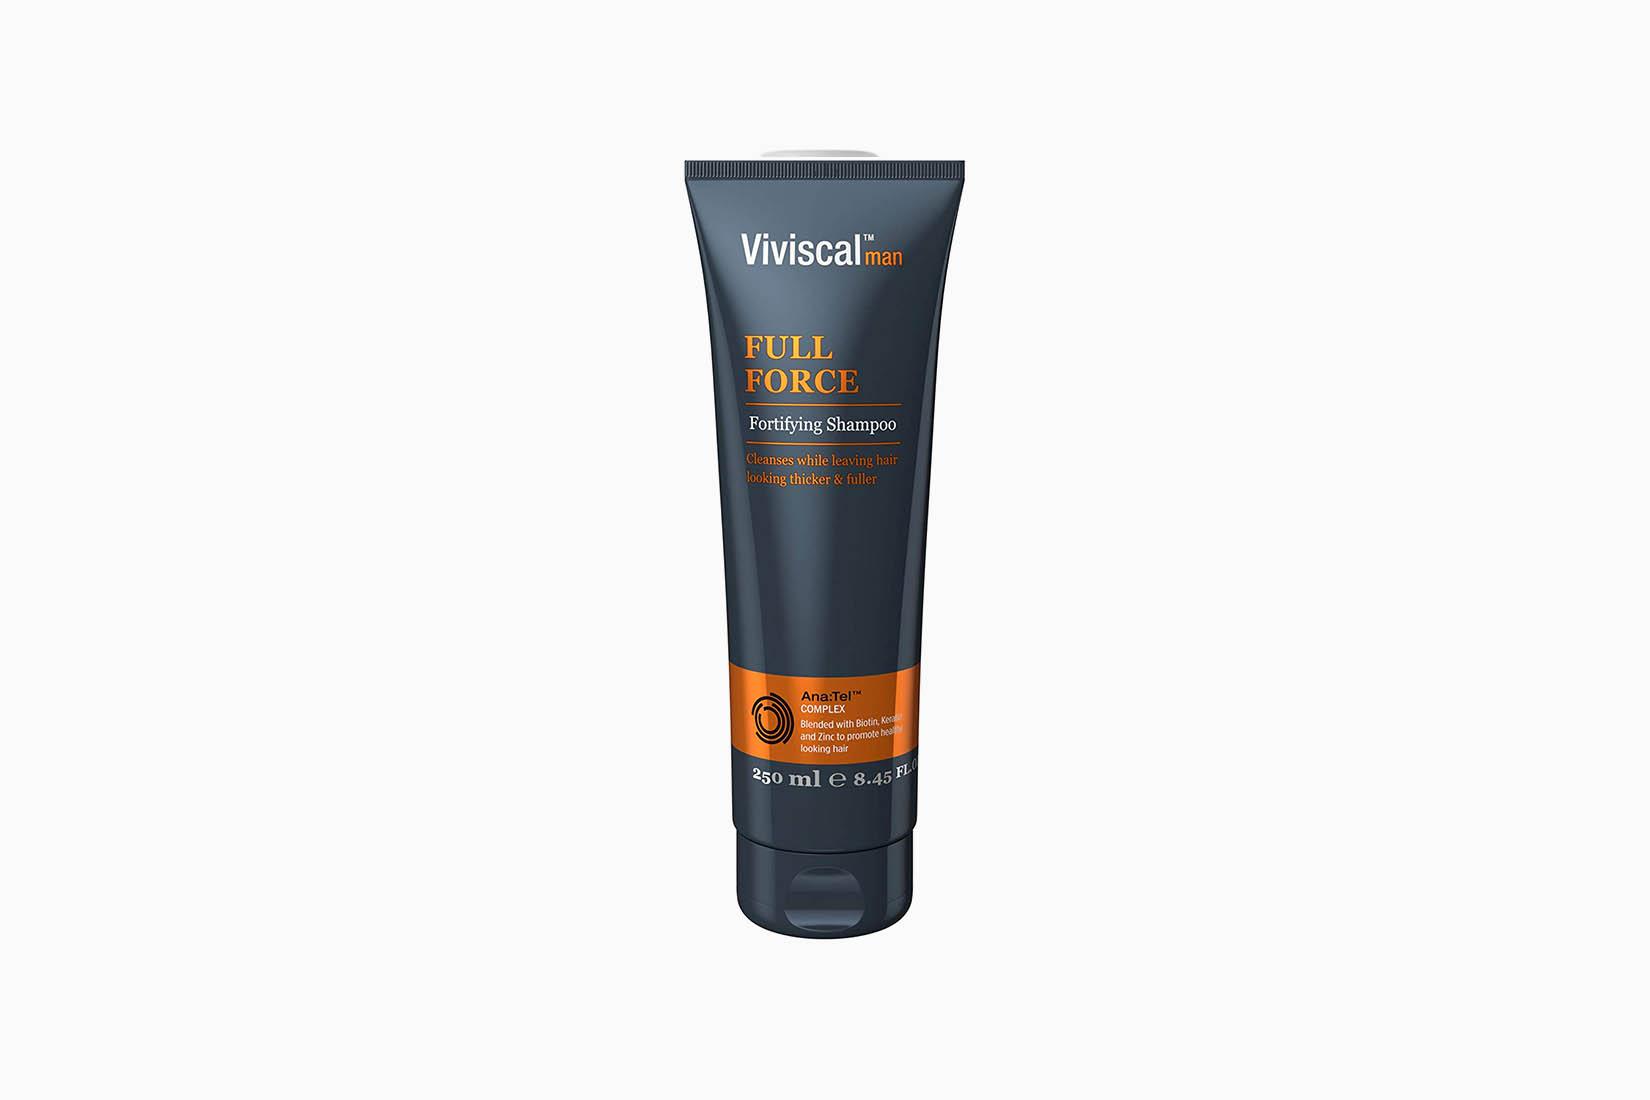 Best Hair Pura Dor Shampoo Men Viviscal Review - Luxe Digital